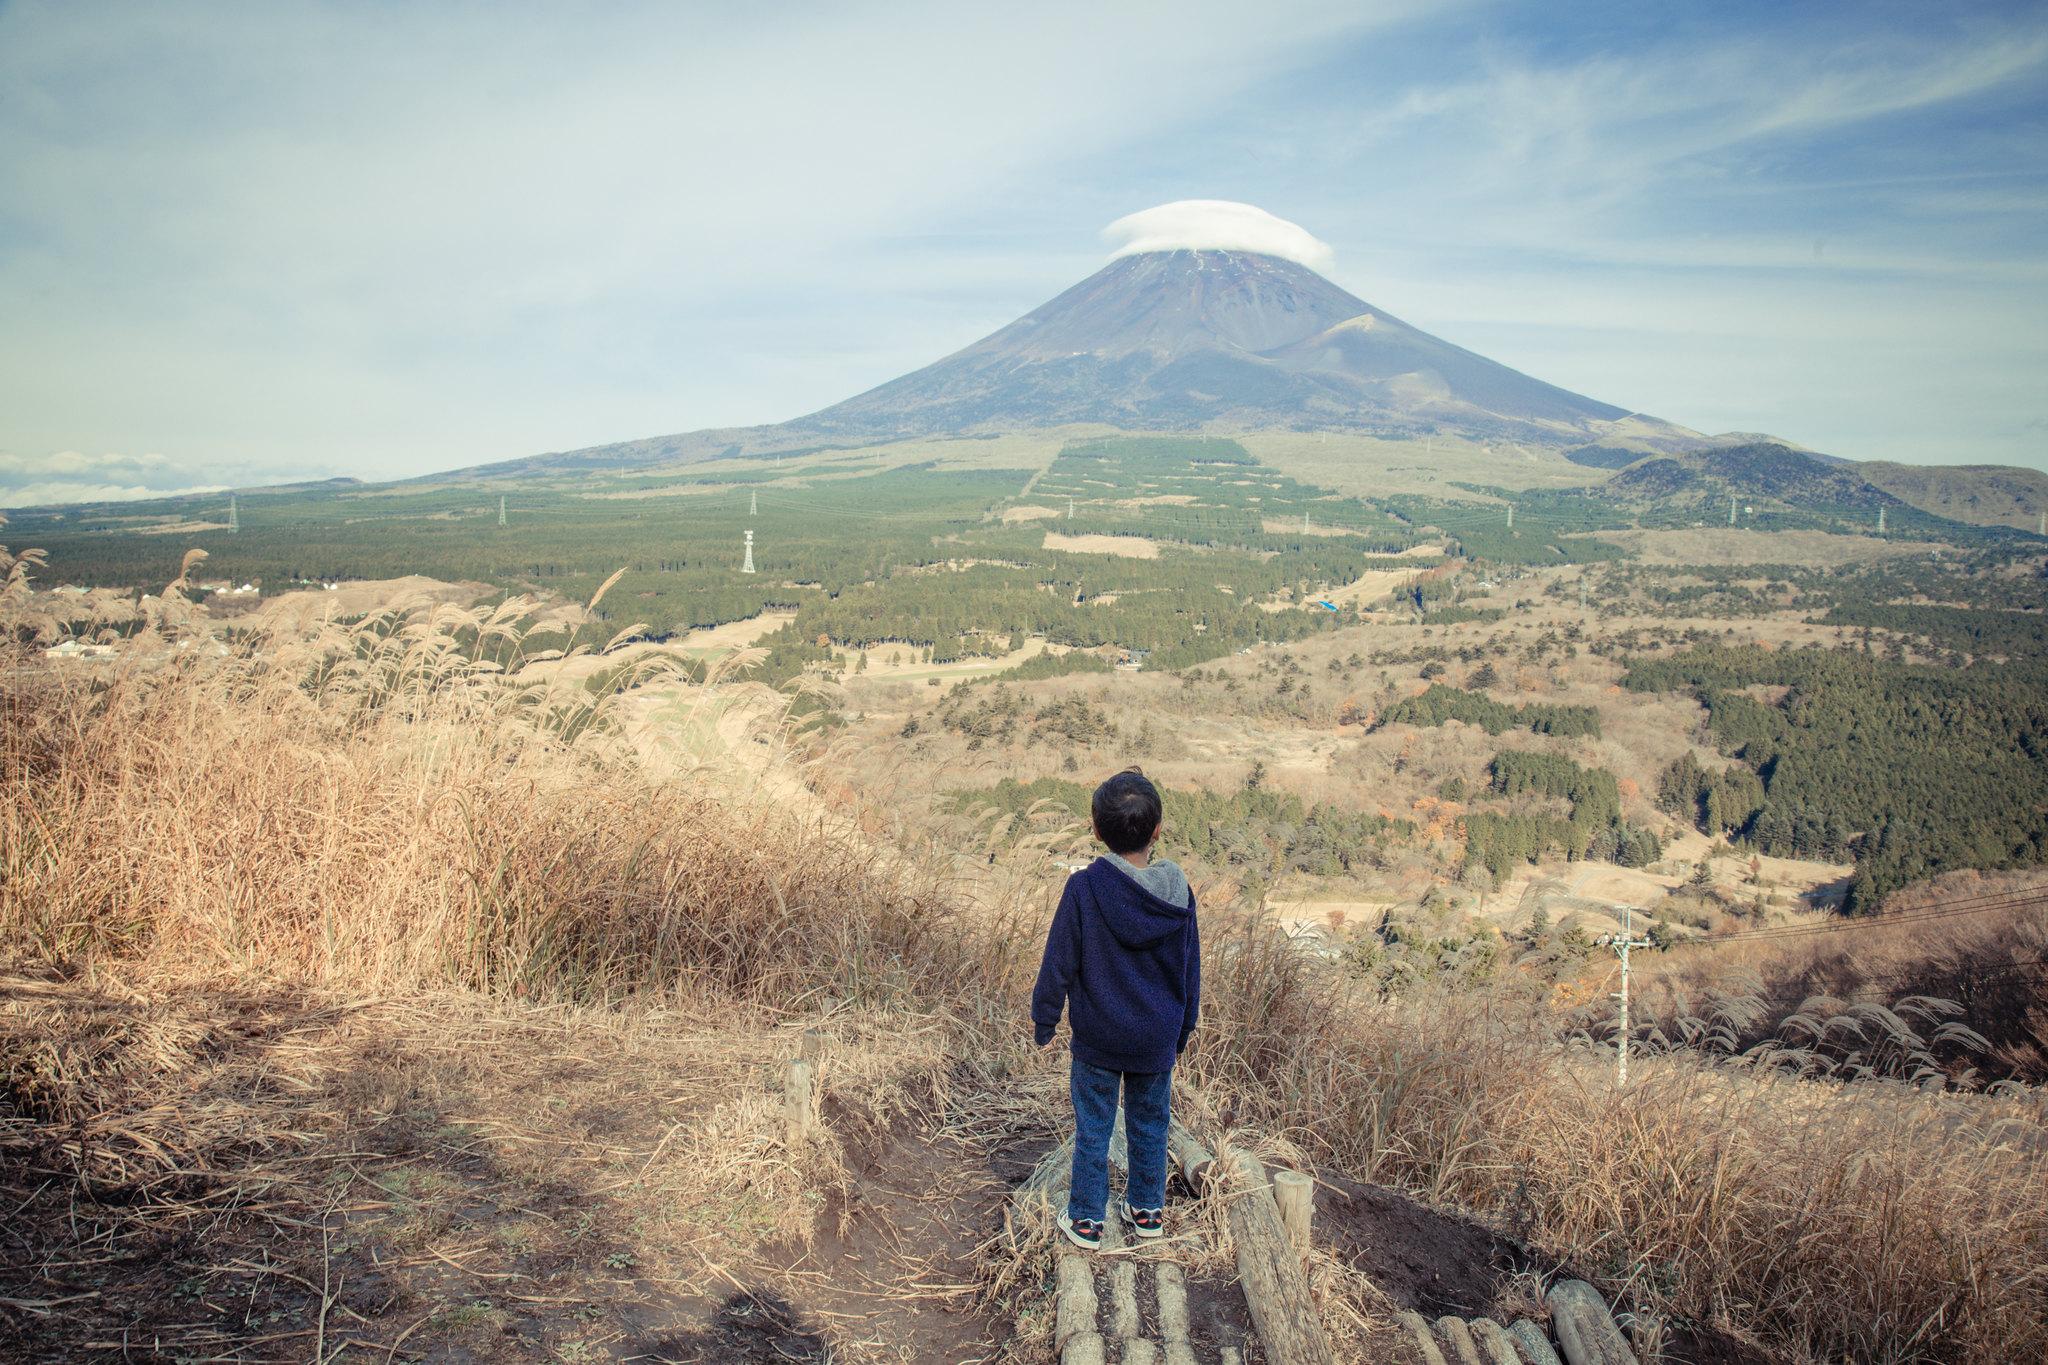 2015-11-17 富士山と子供 001